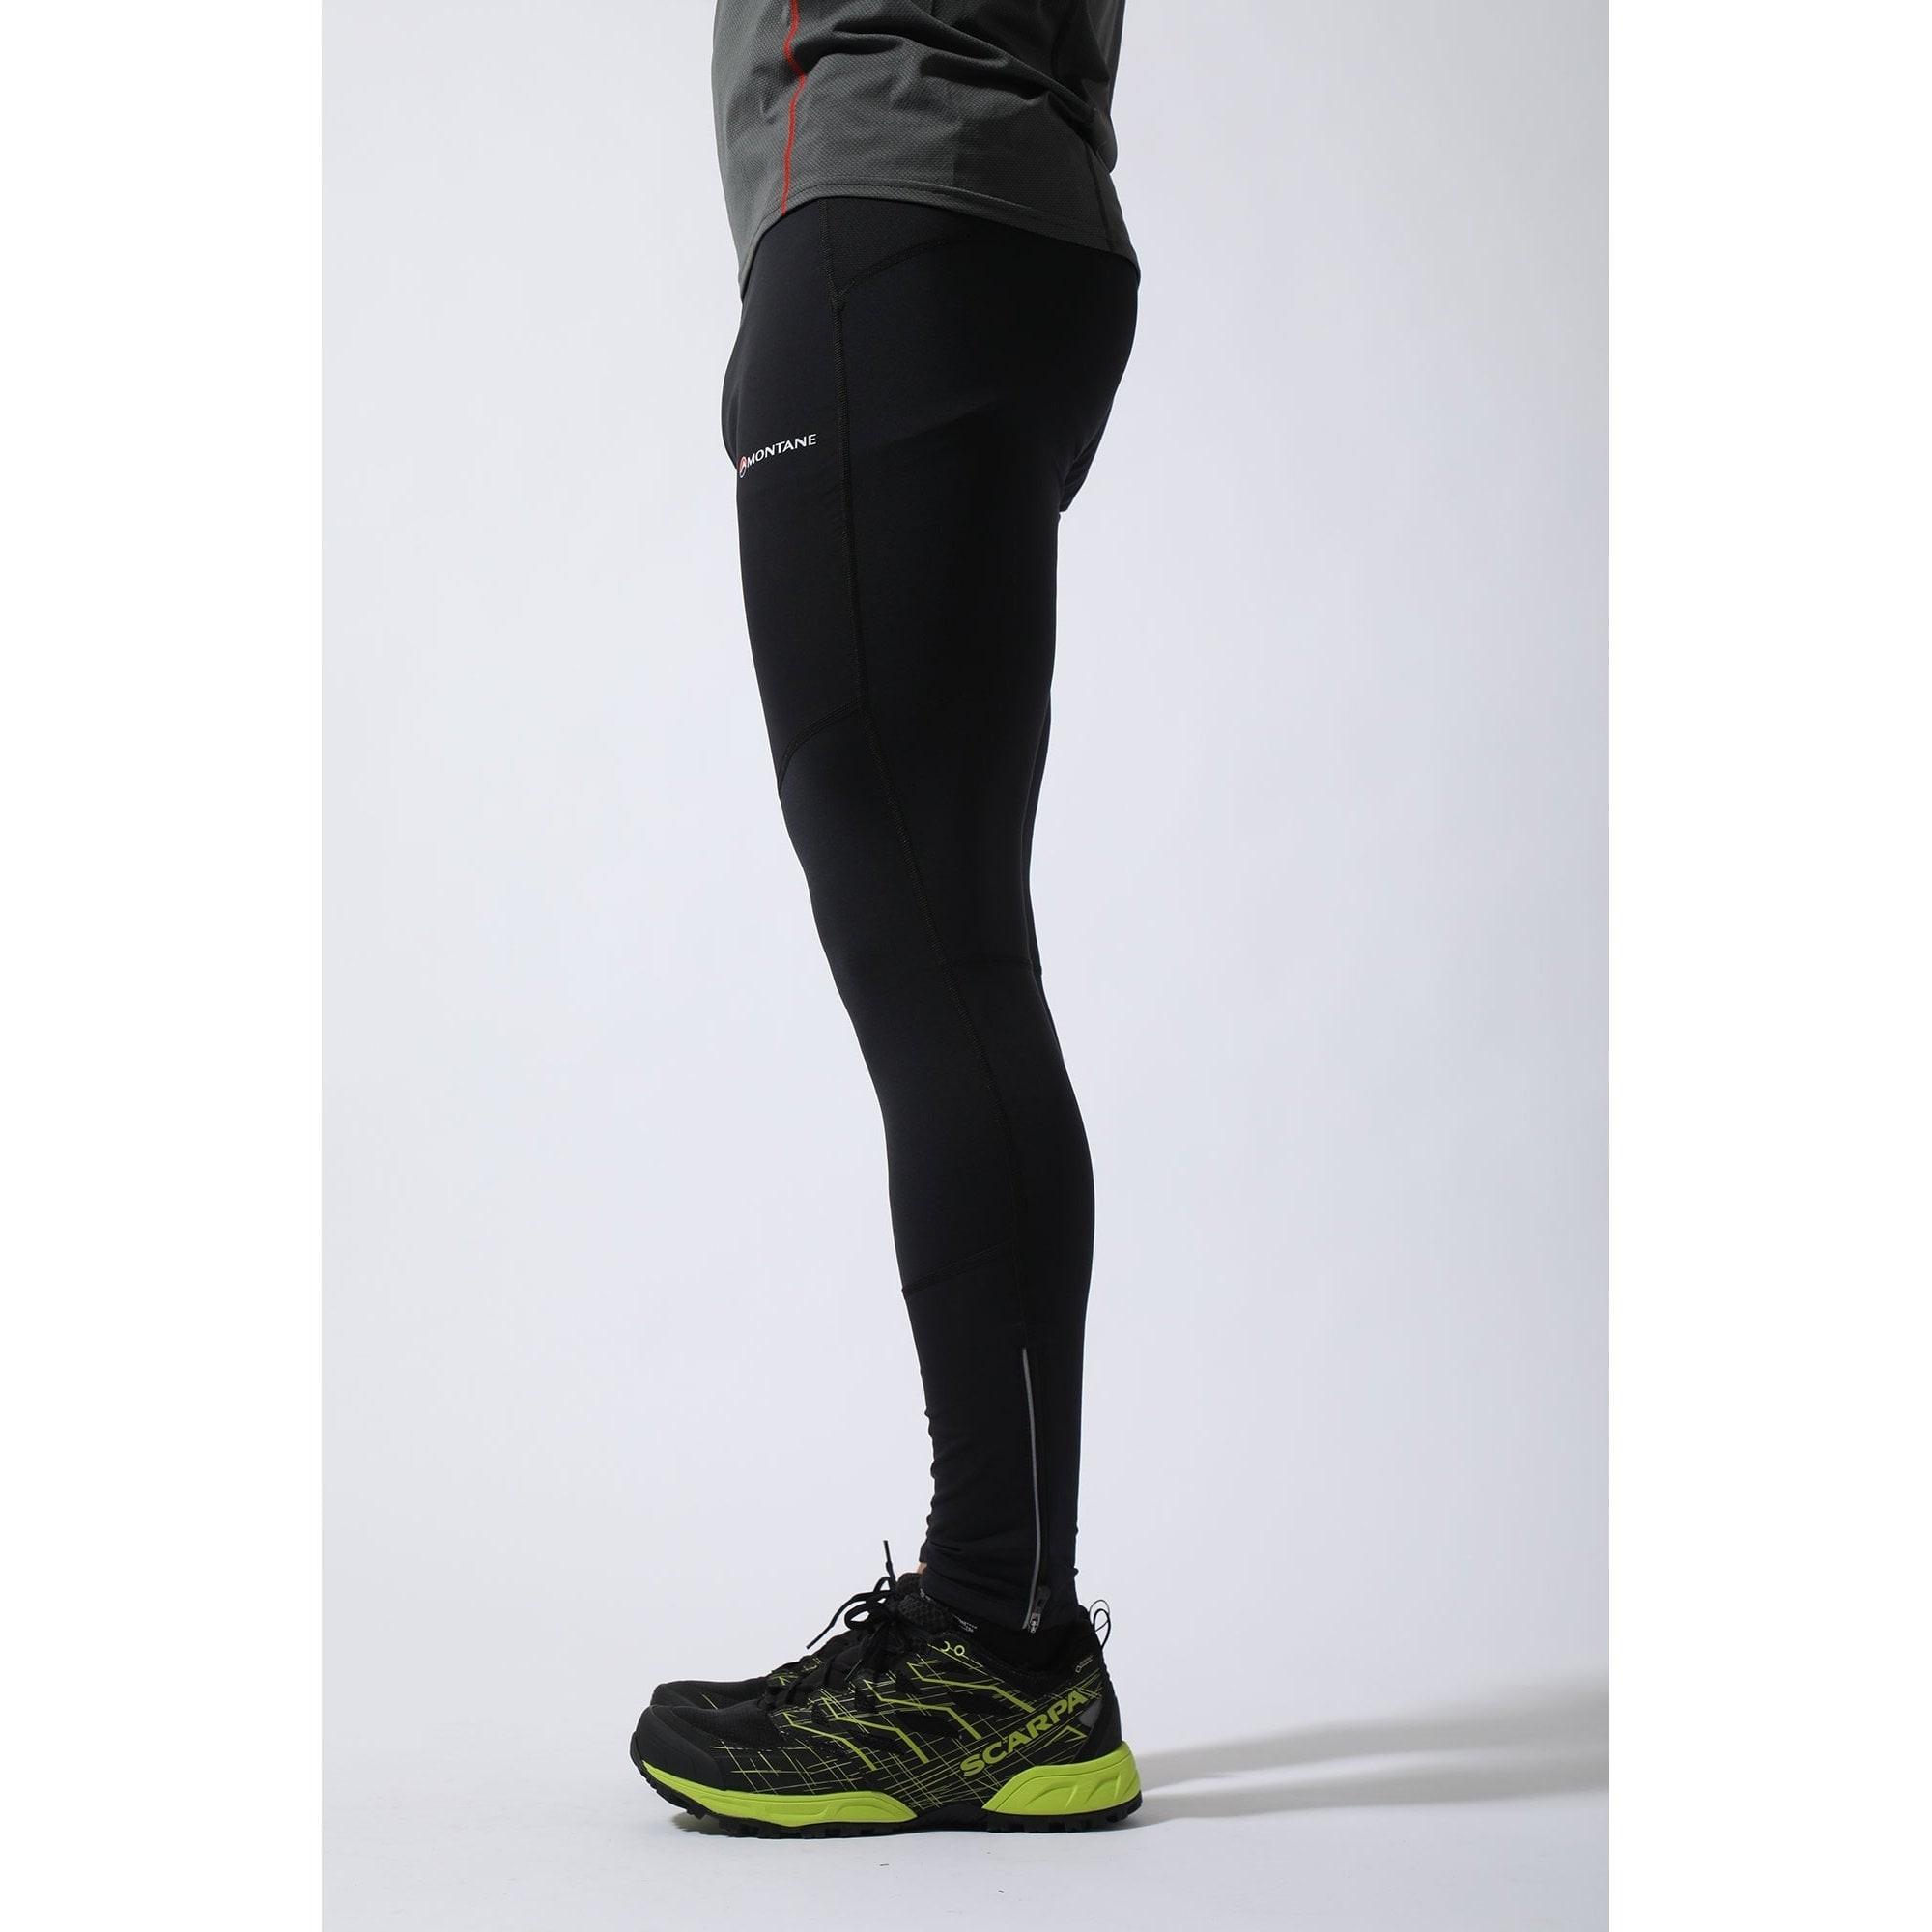 Montane Trail Series Men's Thermal Tights - Black